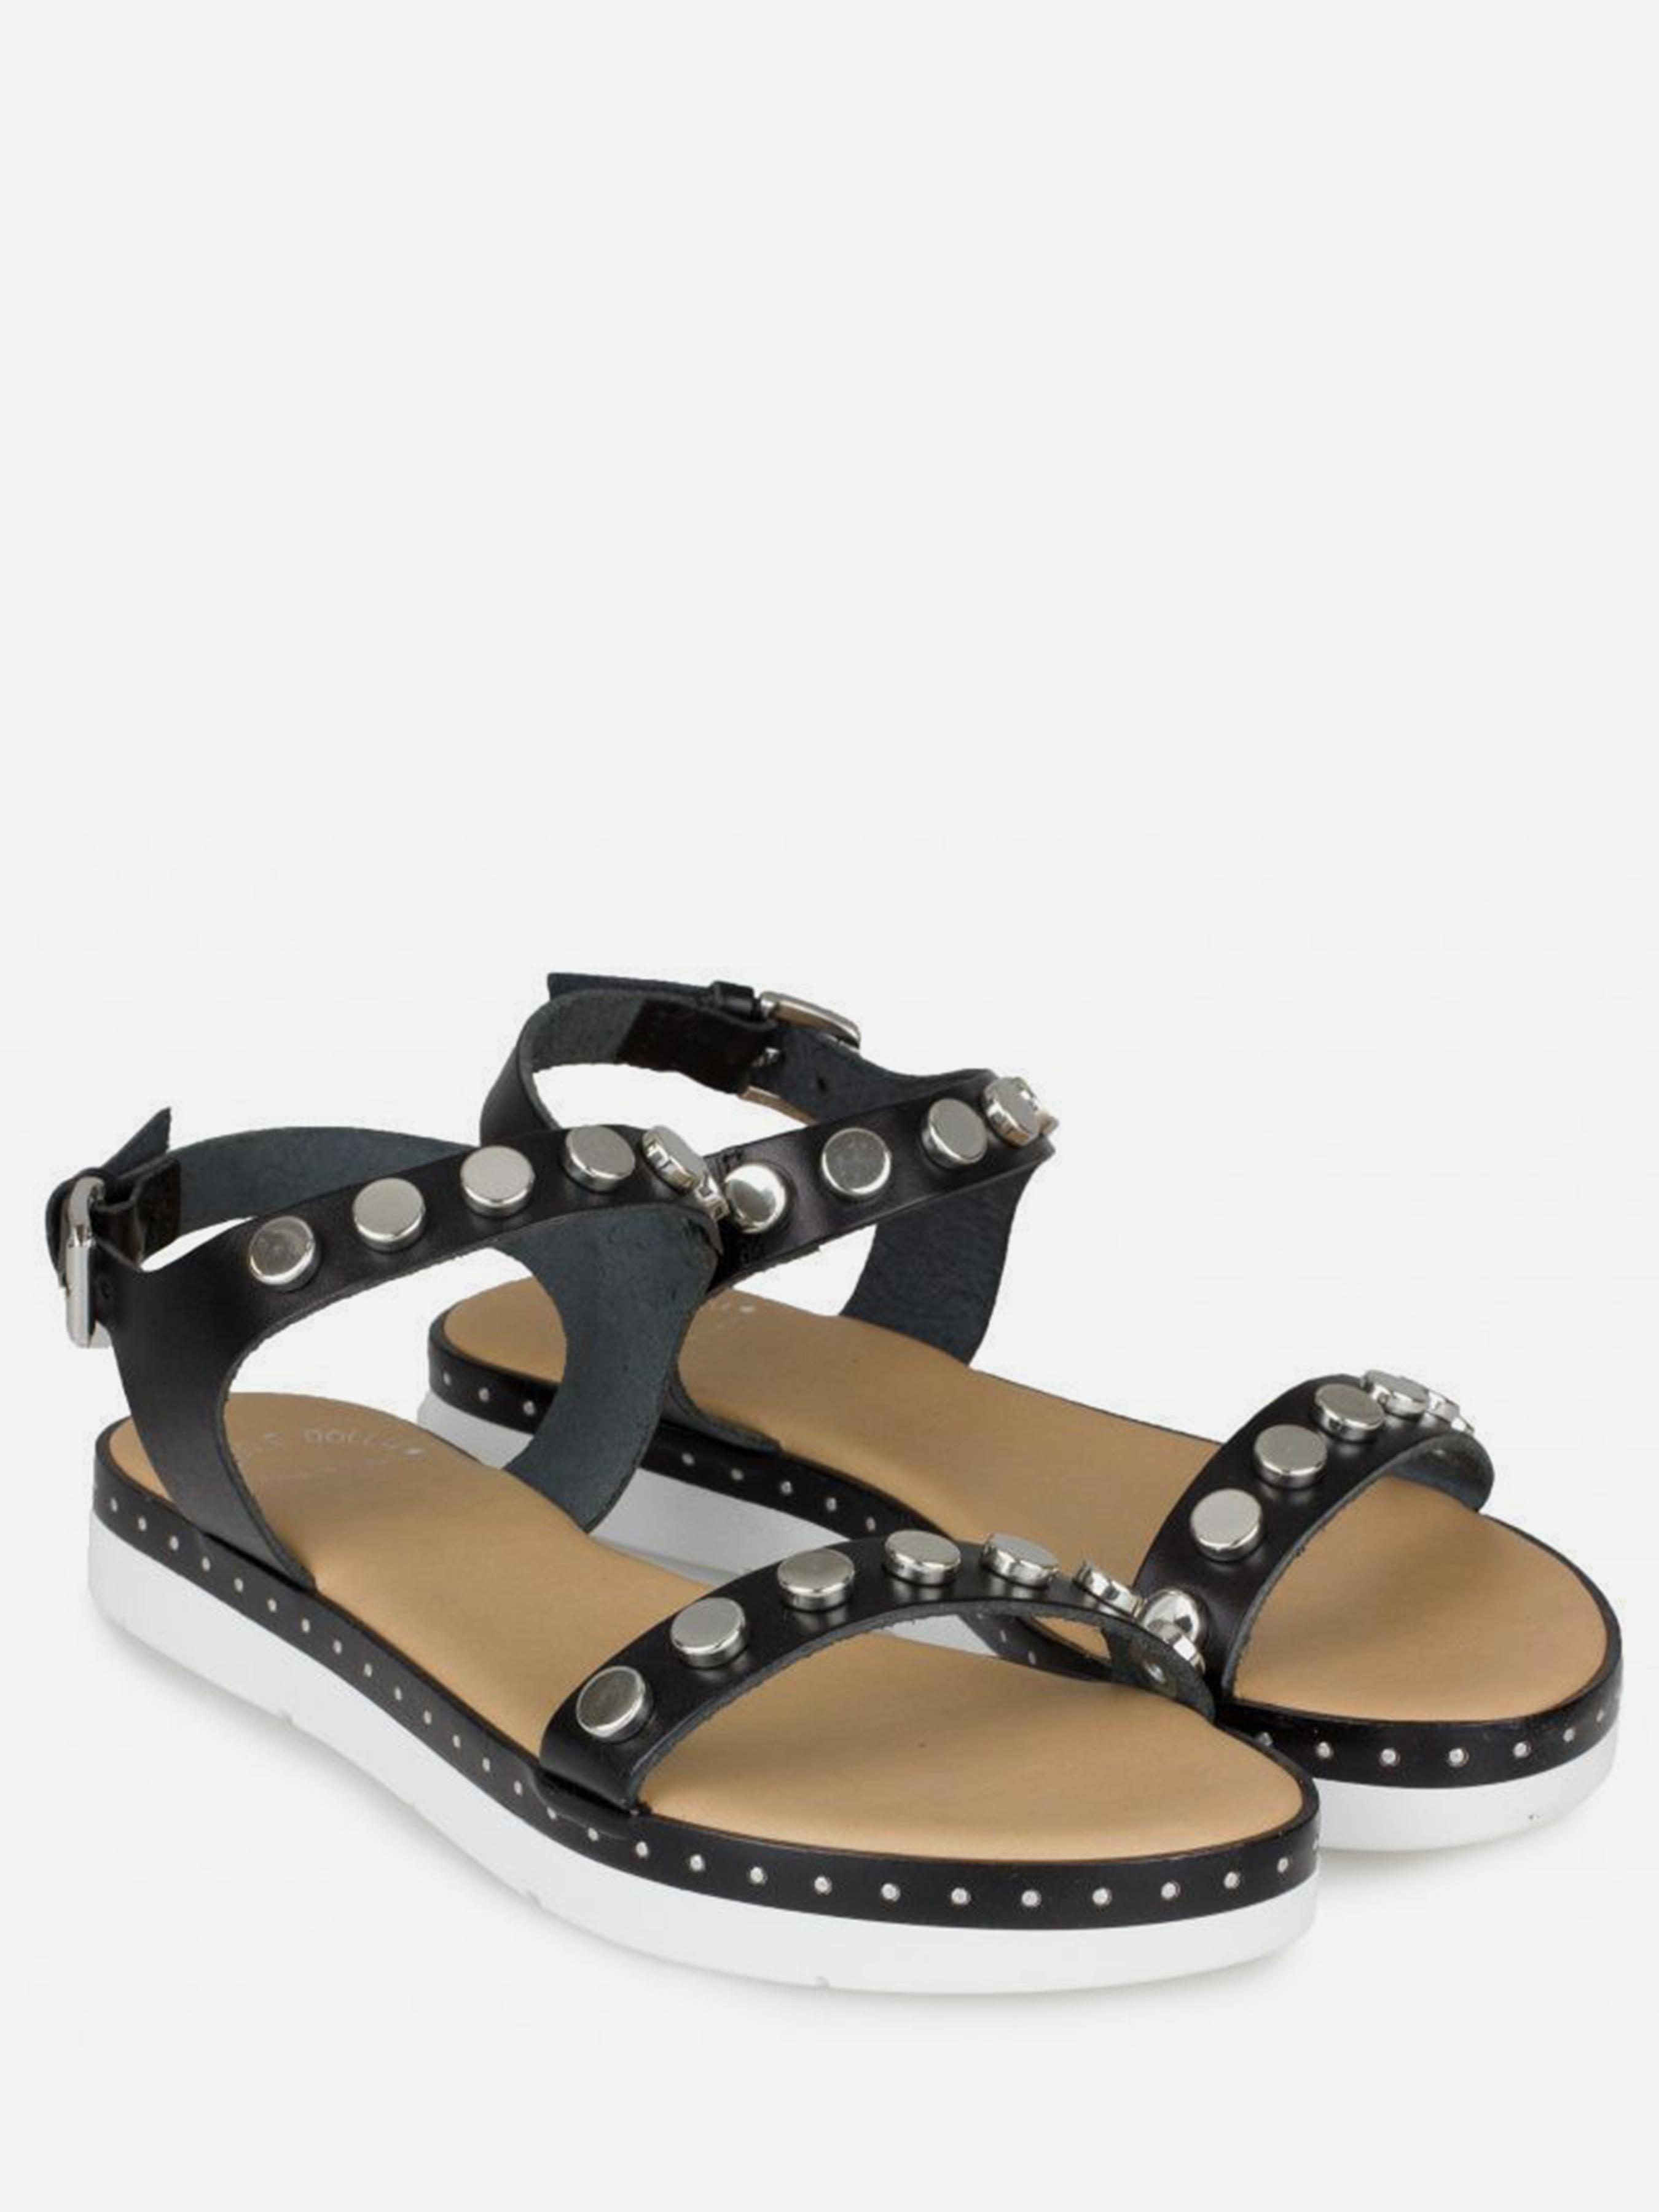 Сандалии для женщин Casta & Dolly 1Z8 модная обувь, 2017